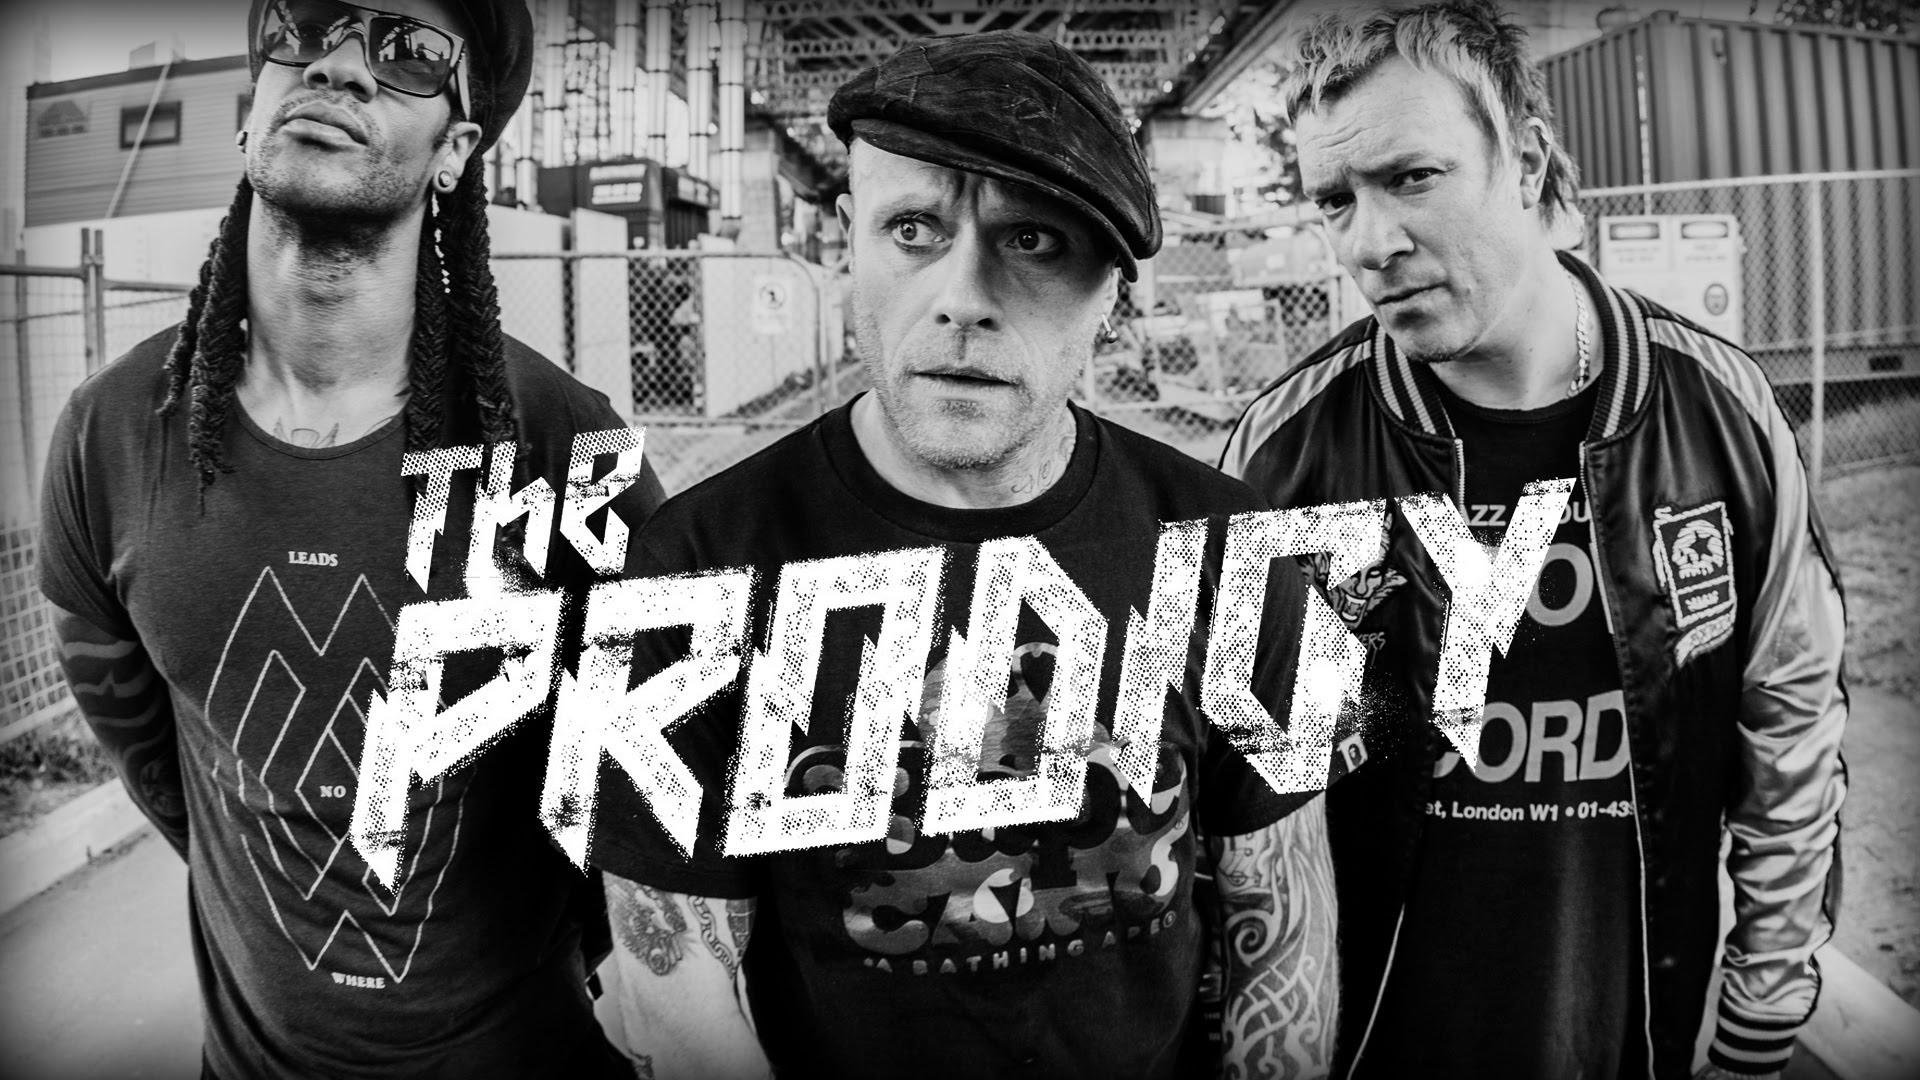 prodigy - photo #30